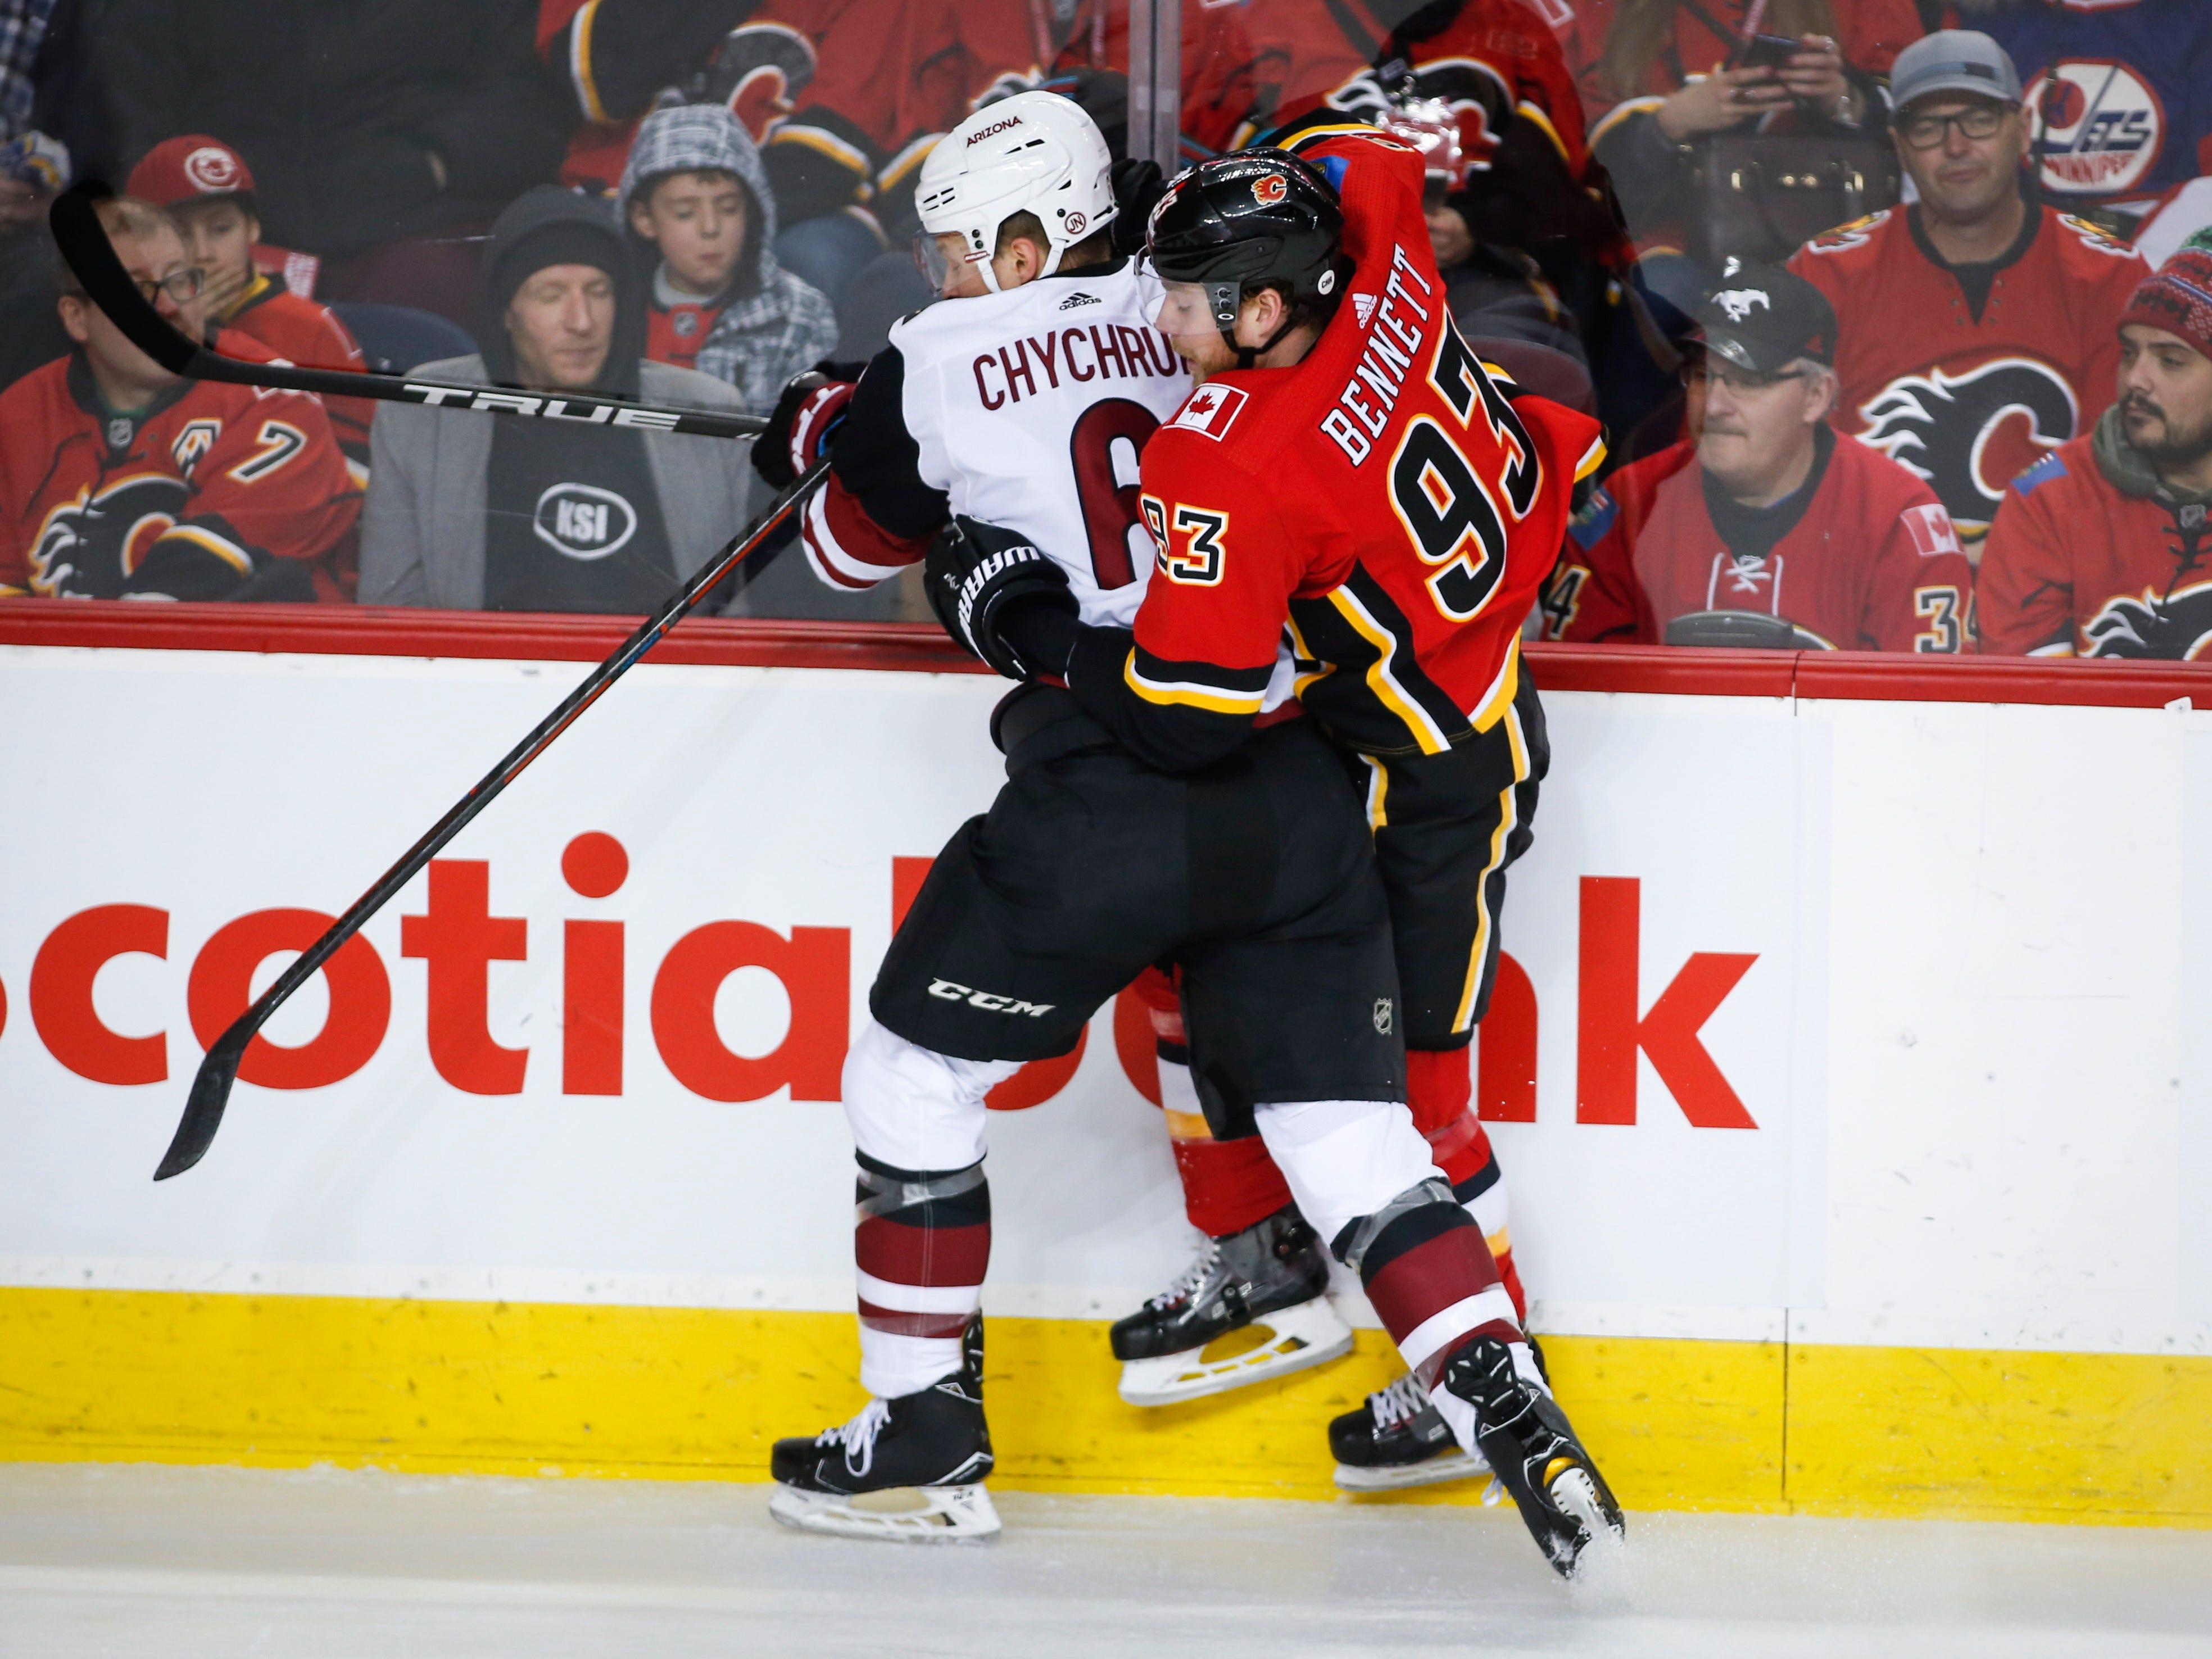 Arizona Coyotes' Jakob Chychrun, left, checks Calgary Flames' Sam Bennett during first period NHL hockey action in Calgary,  Calgary, Alberta, Monday, Feb. 18, 2019.